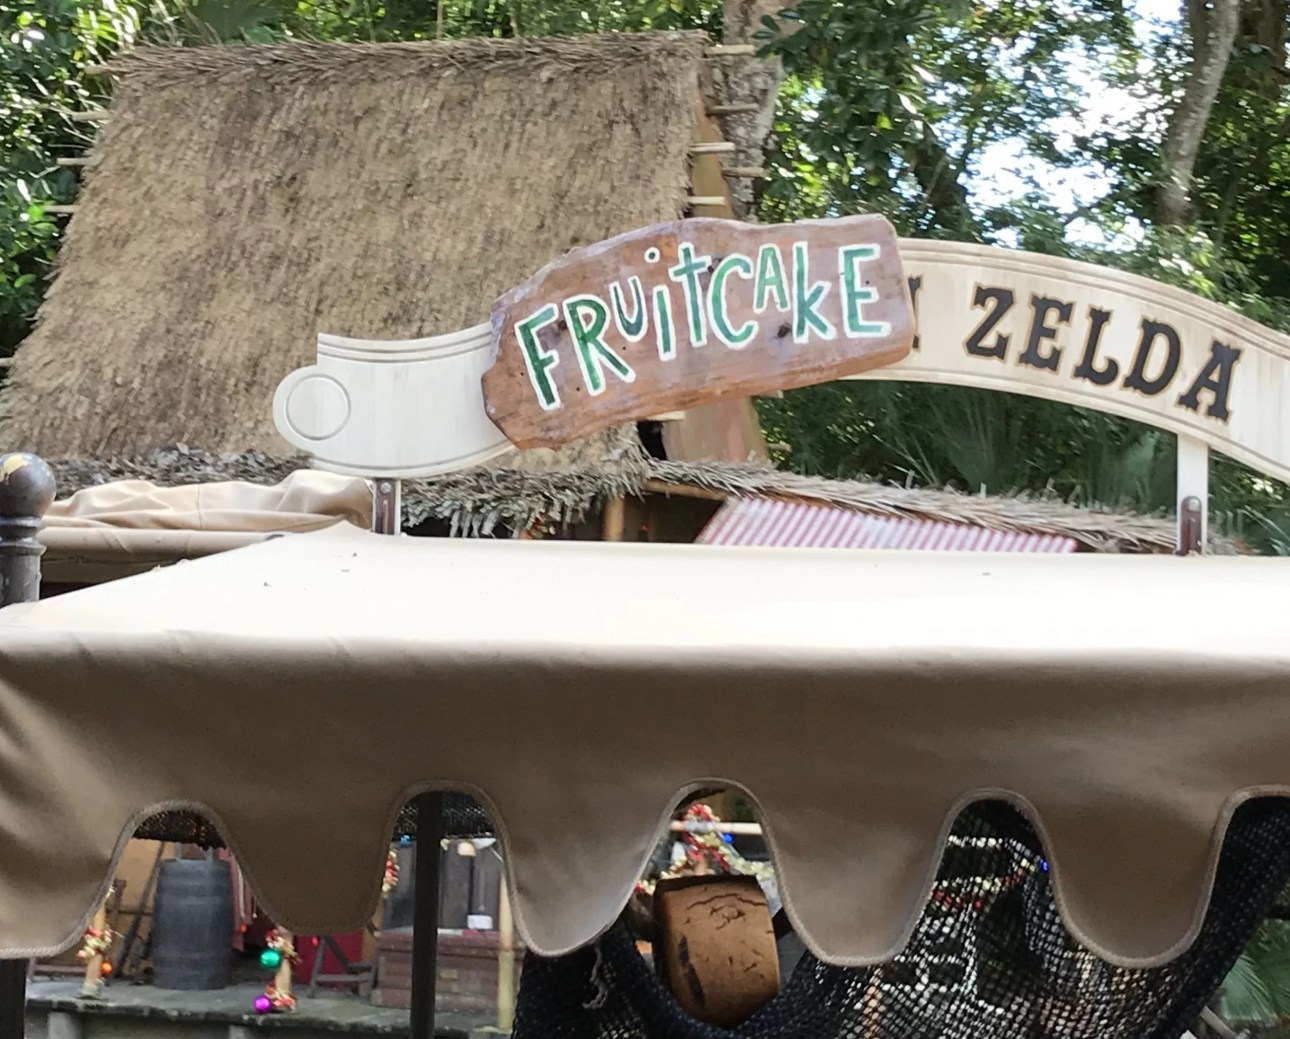 Fruitcake Zelda on Jingle Cruise in Magic Kingdom